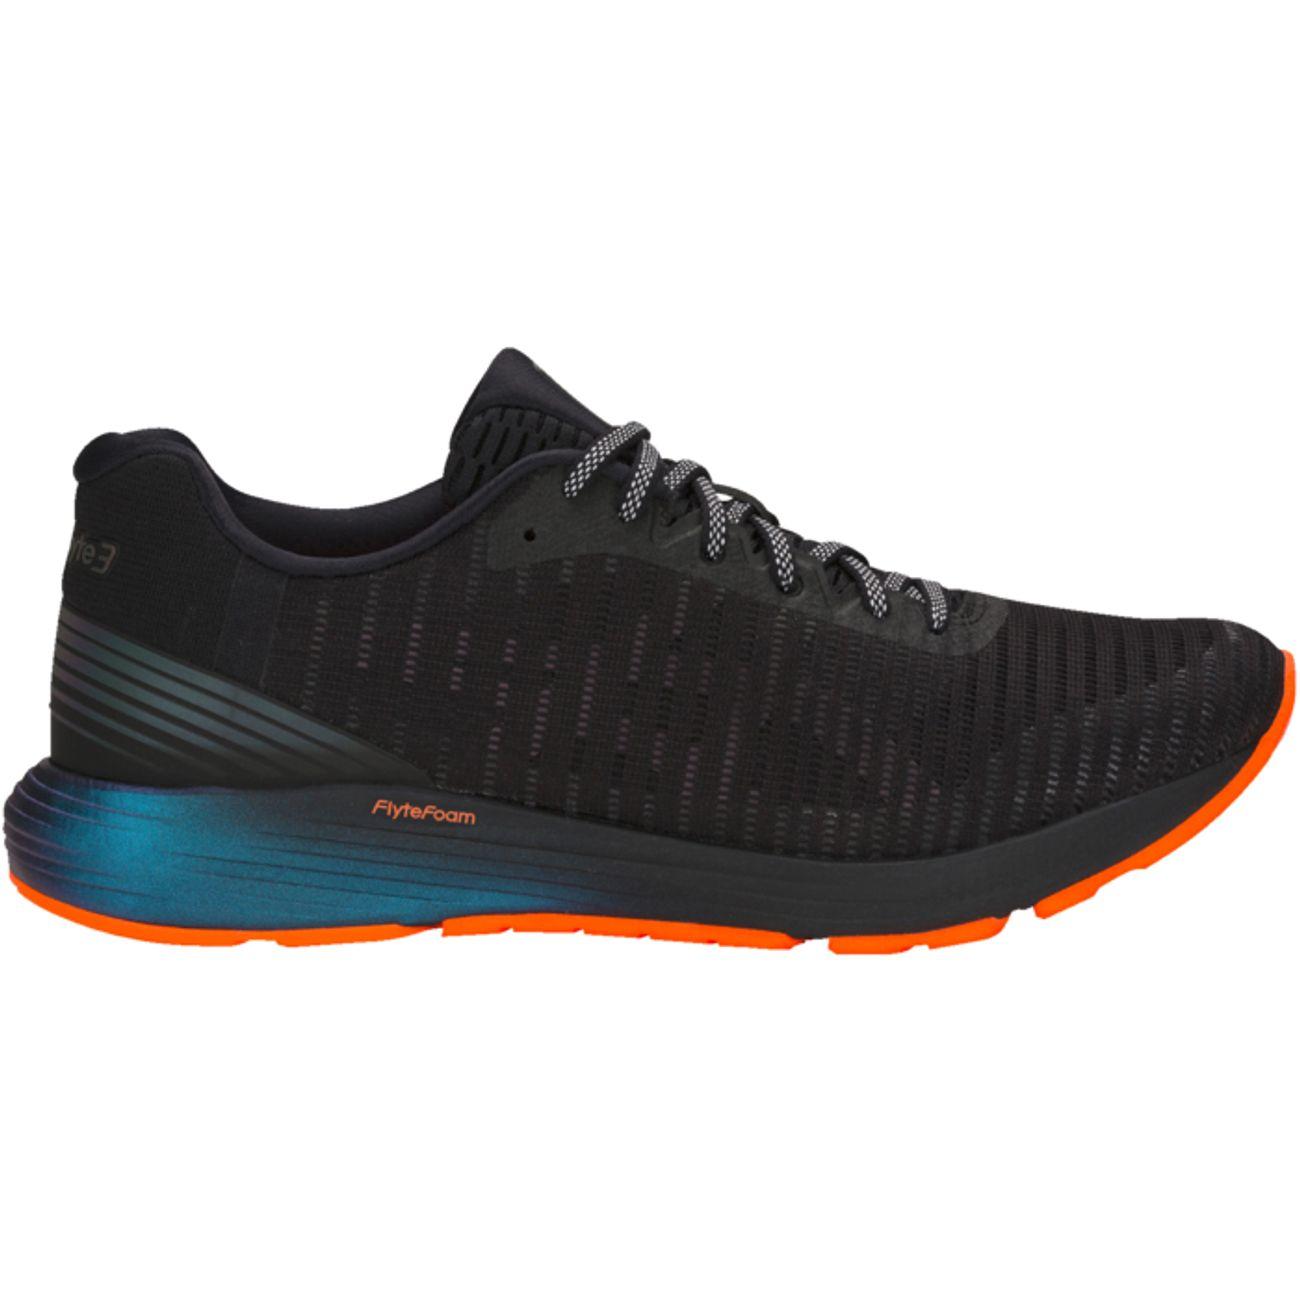 3 Basses Liteshow Dynaflyte Asics Homme Running Chaussures qSpzVUM